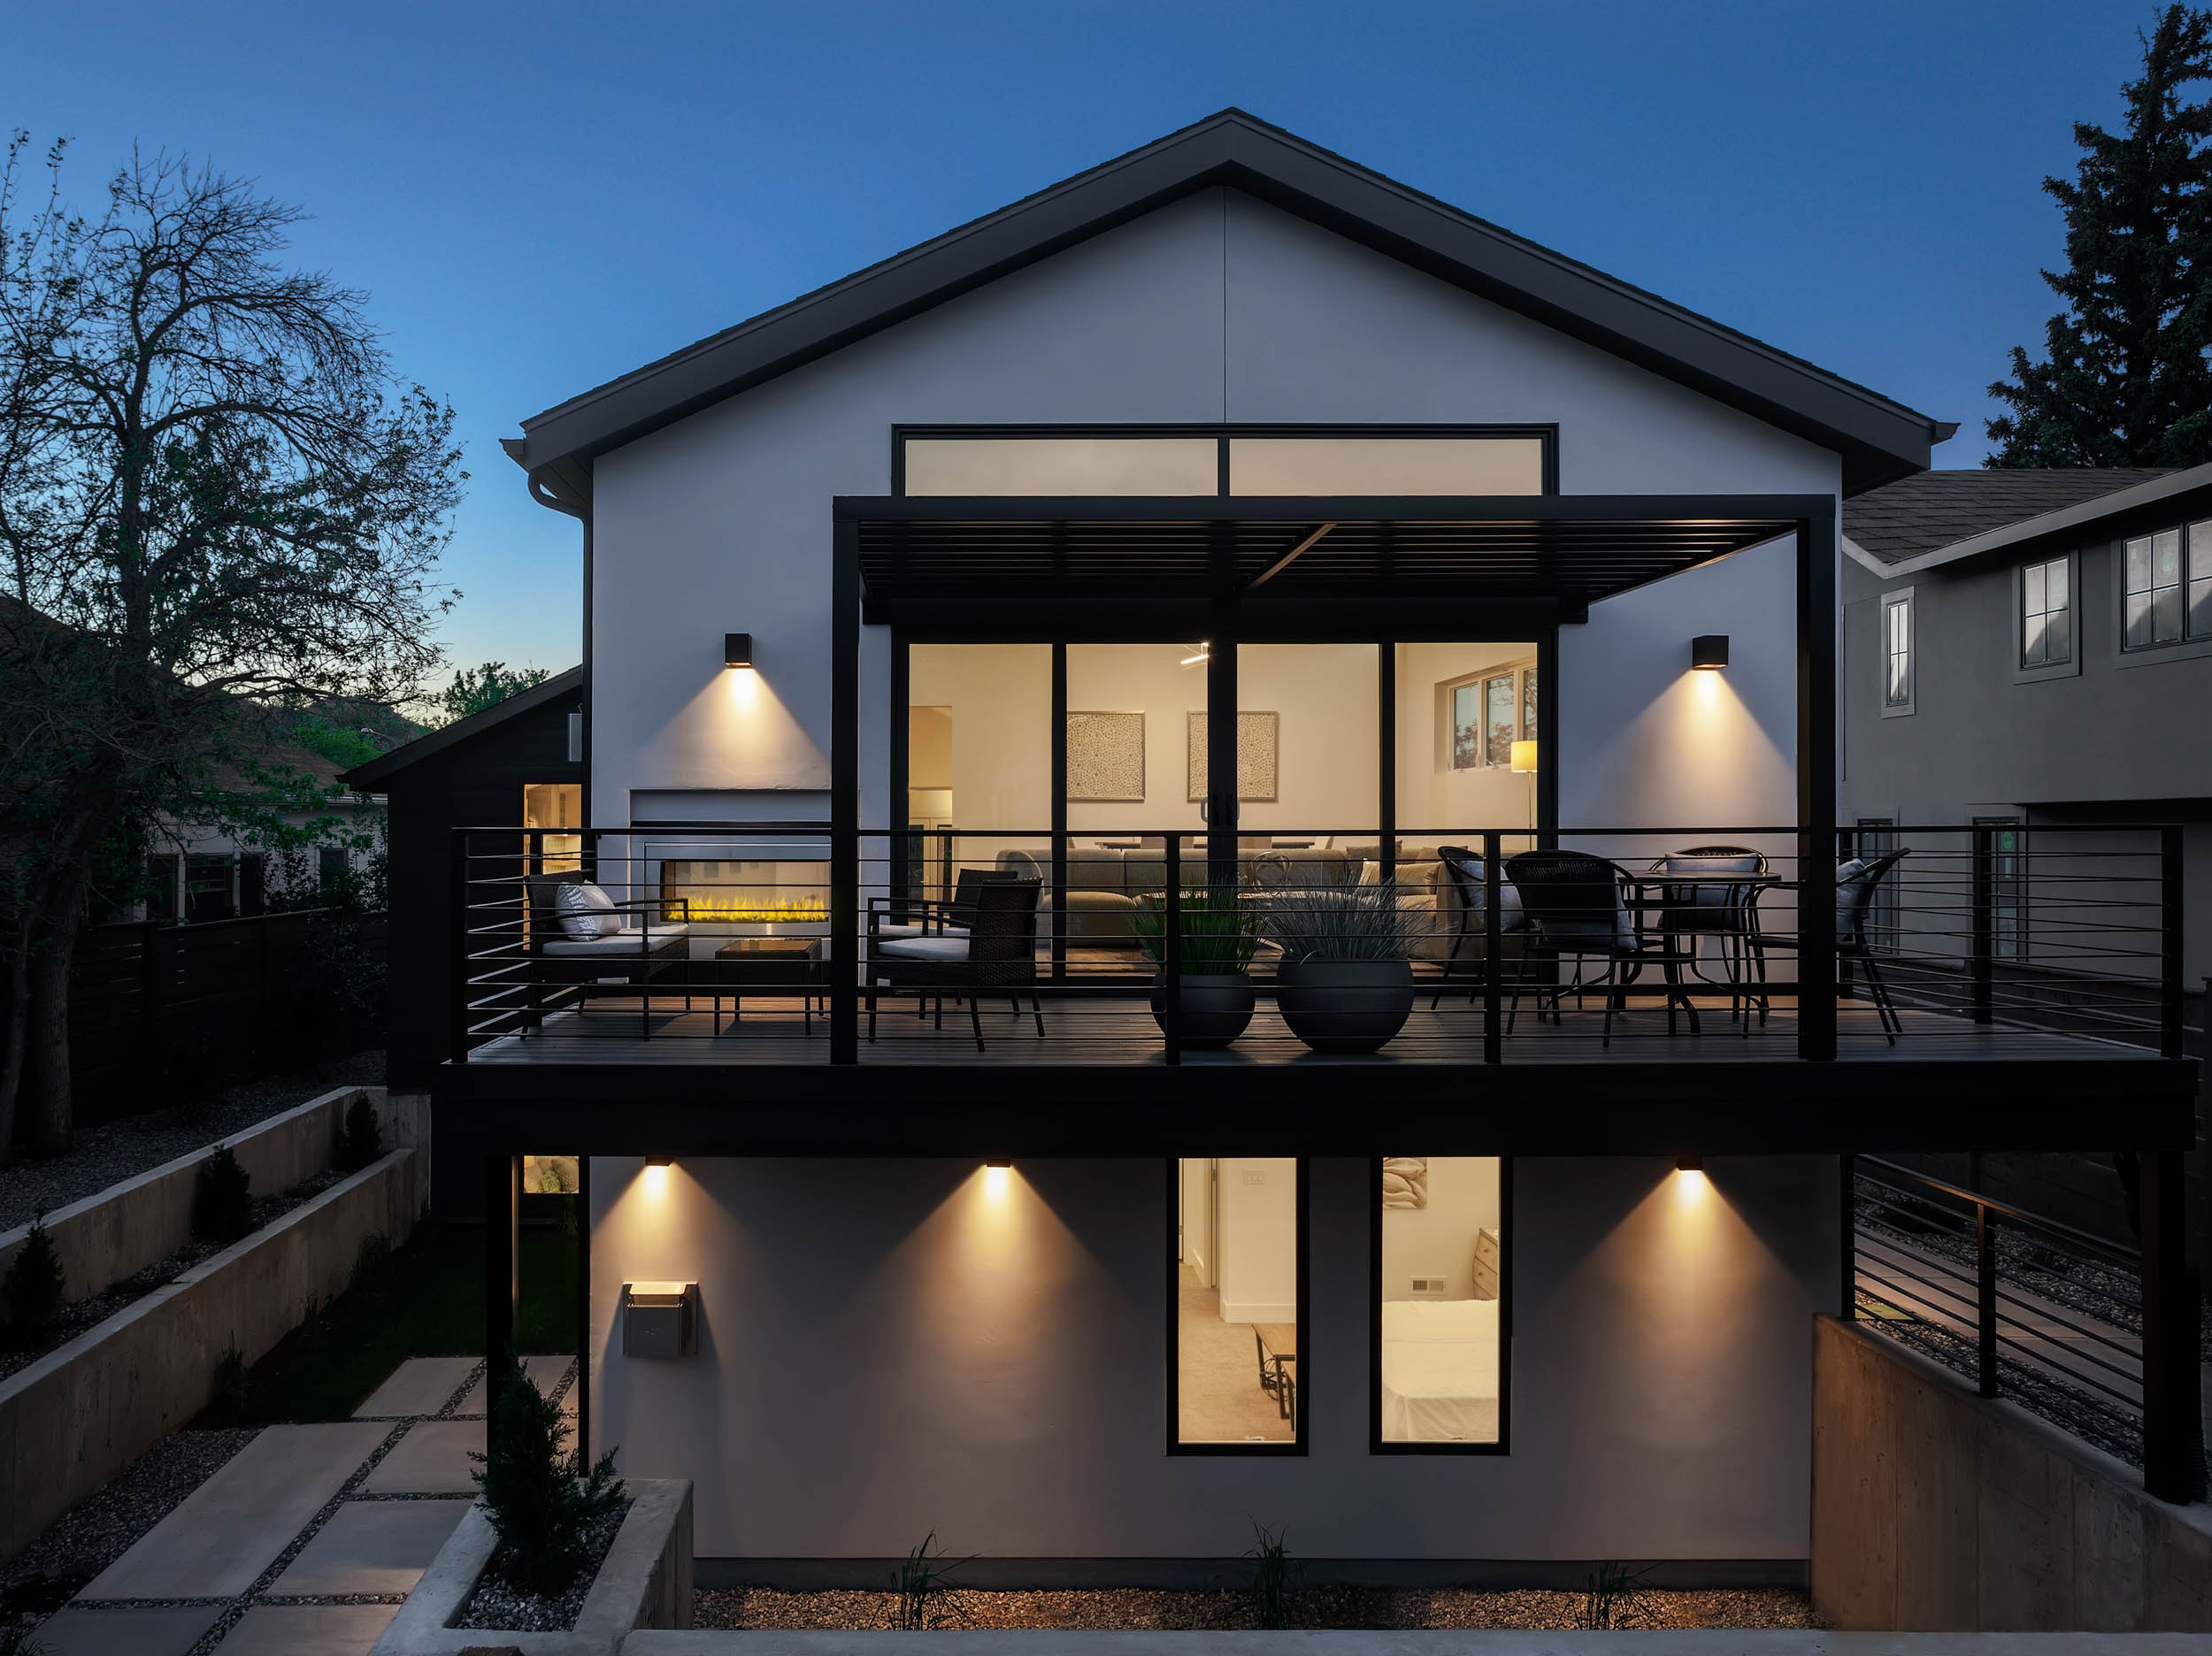 Architect: Kristin Reisinger @ SpaceCraft Architecture